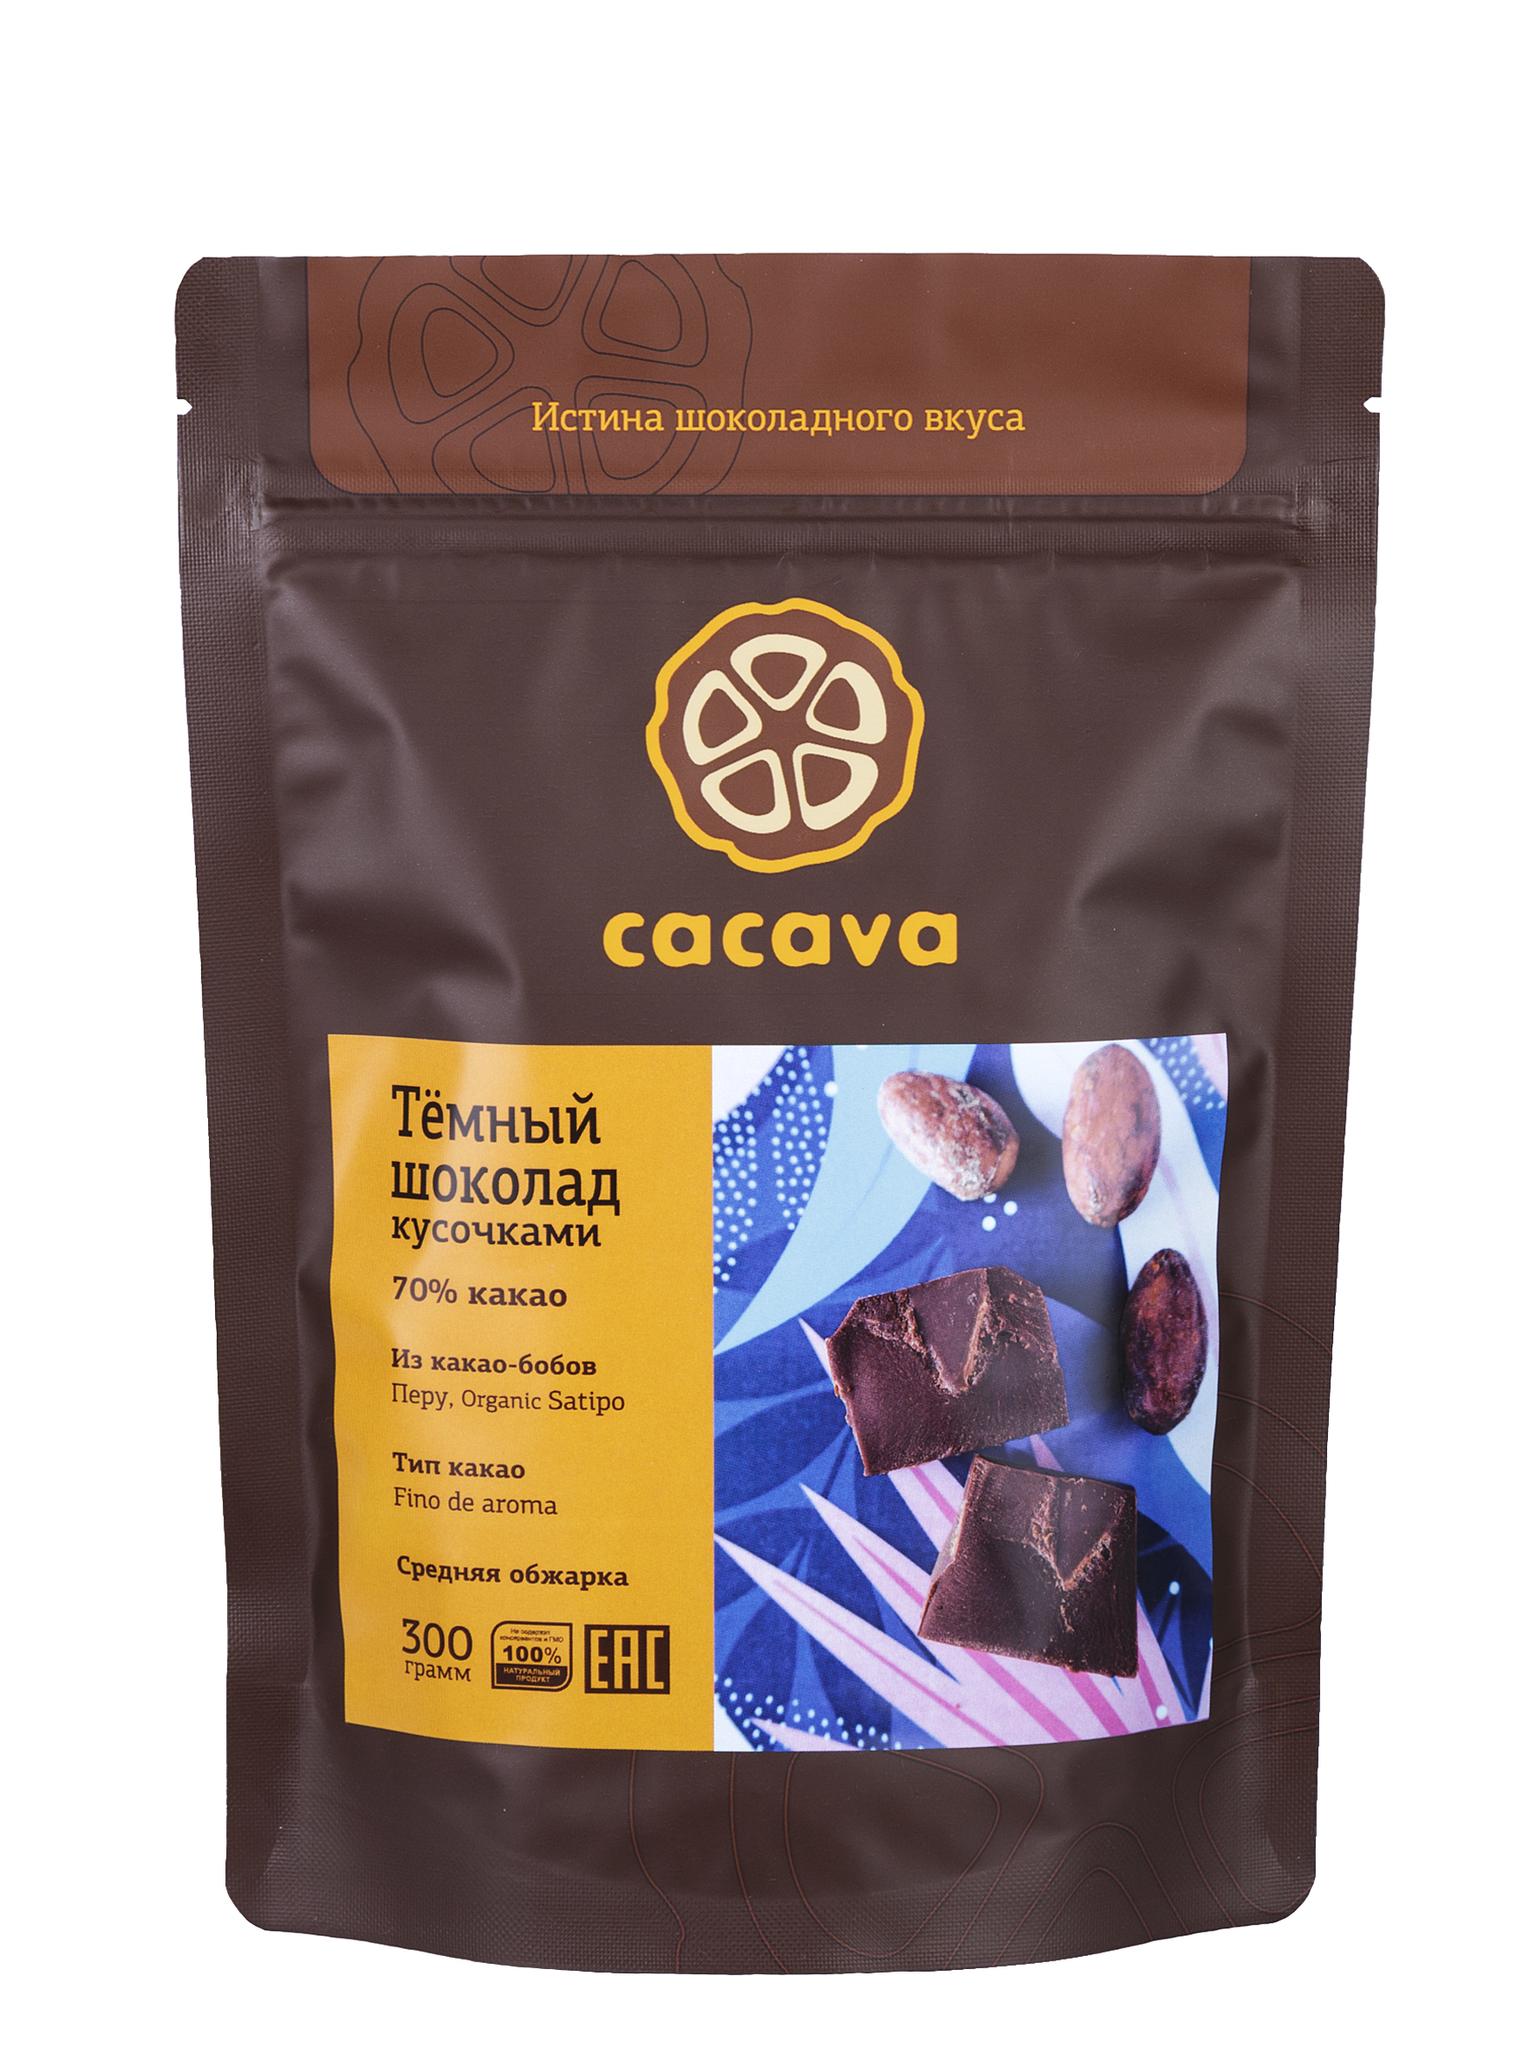 Тёмный шоколад 70 % какао (Перу, Organic Satipo), упаковка 300 грамм